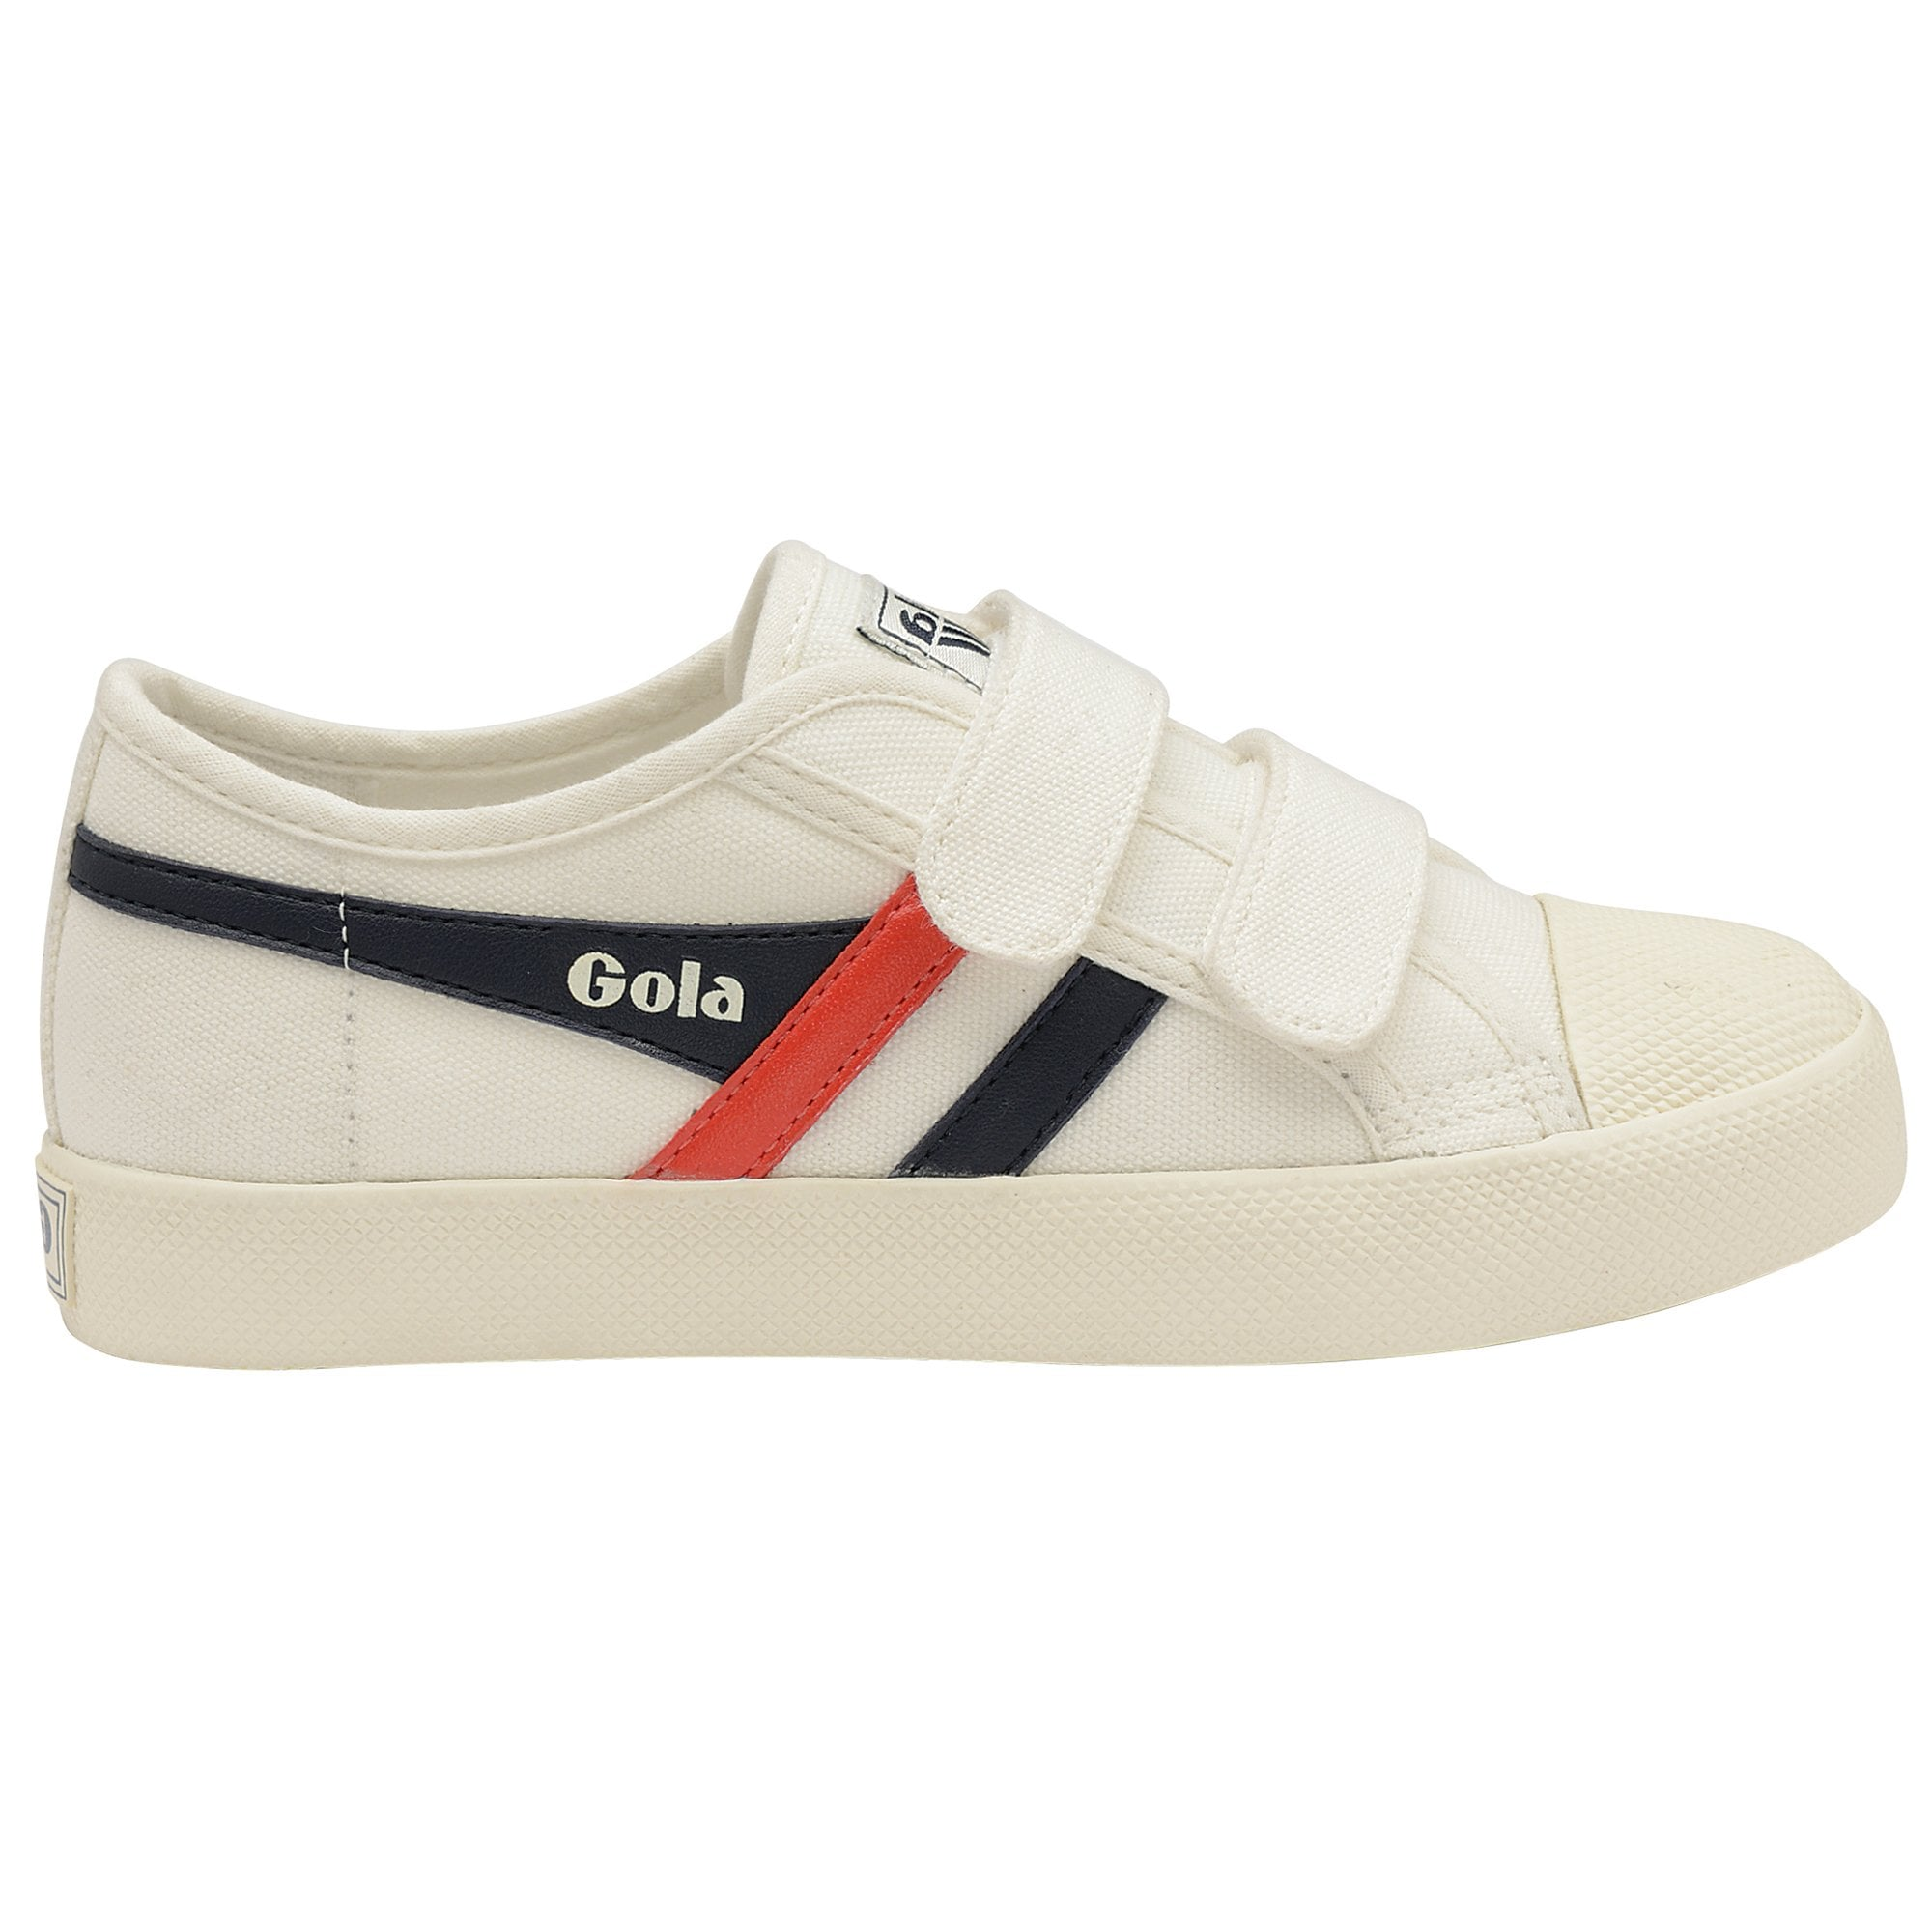 Buy Gola kids Coaster Strap sneakers online